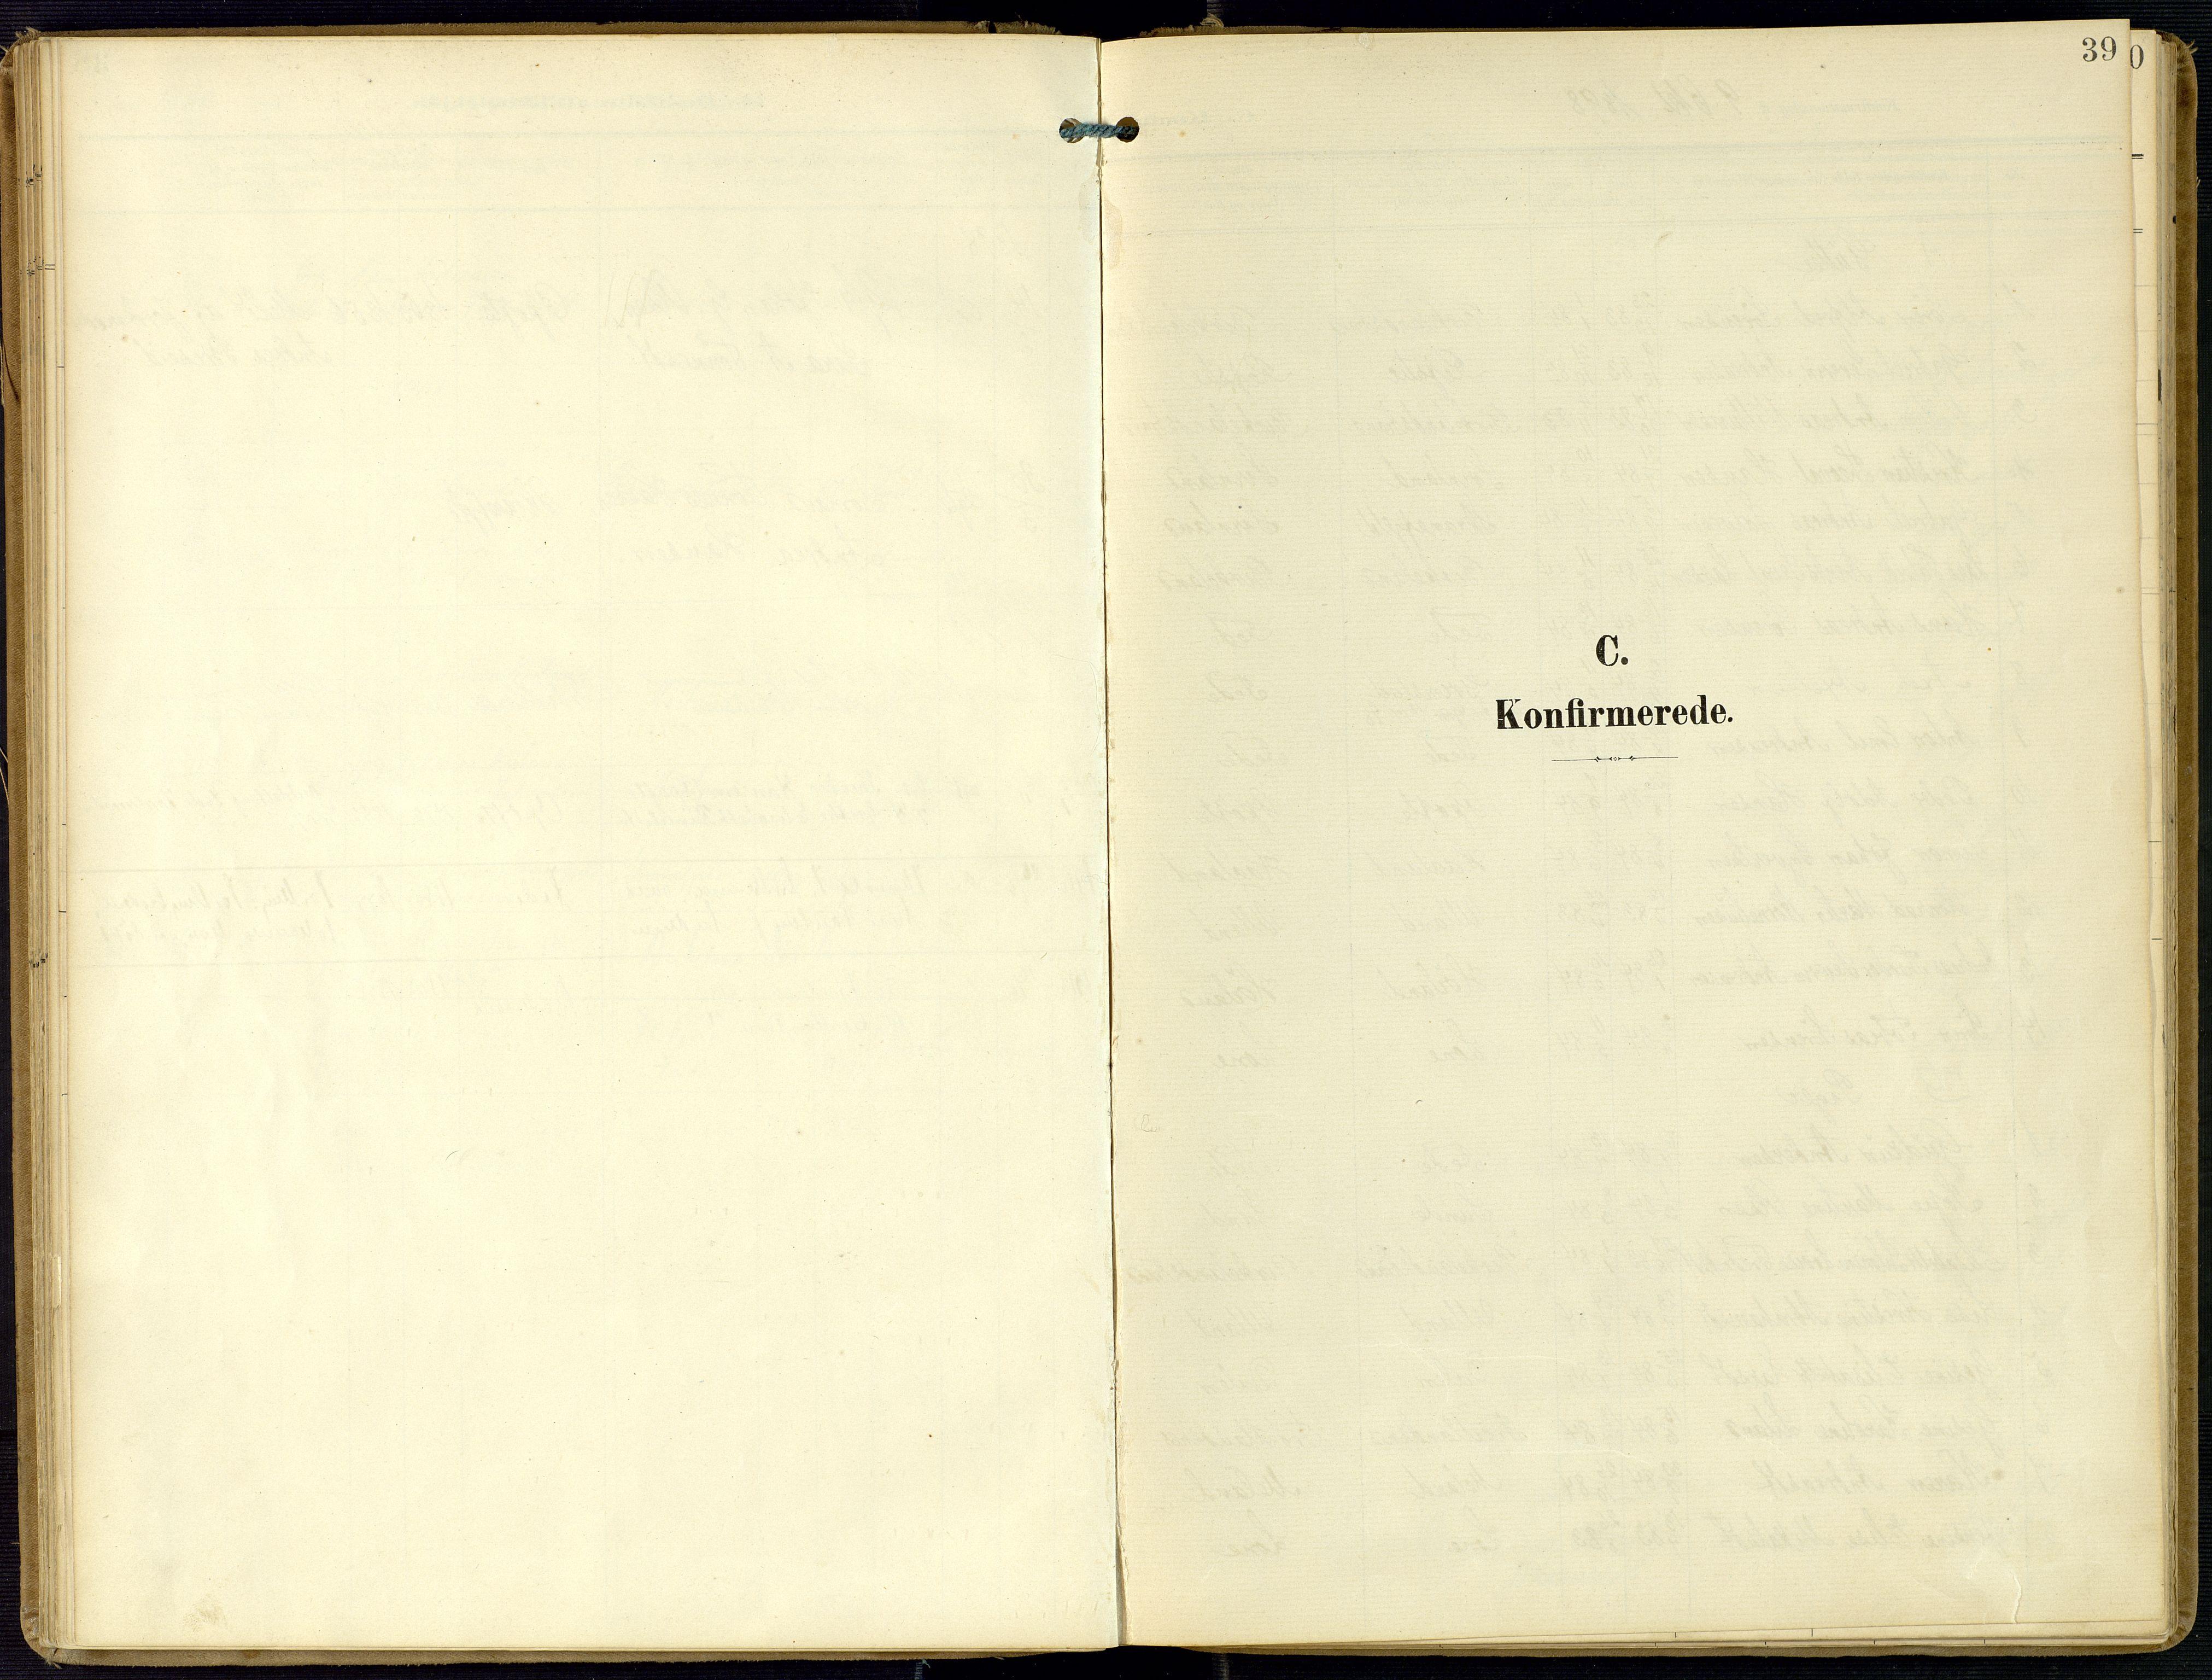 SAK, Kvinesdal sokneprestkontor, F/Fa/Faa/L0005: Ministerialbok nr. A 5, 1898-1915, s. 39